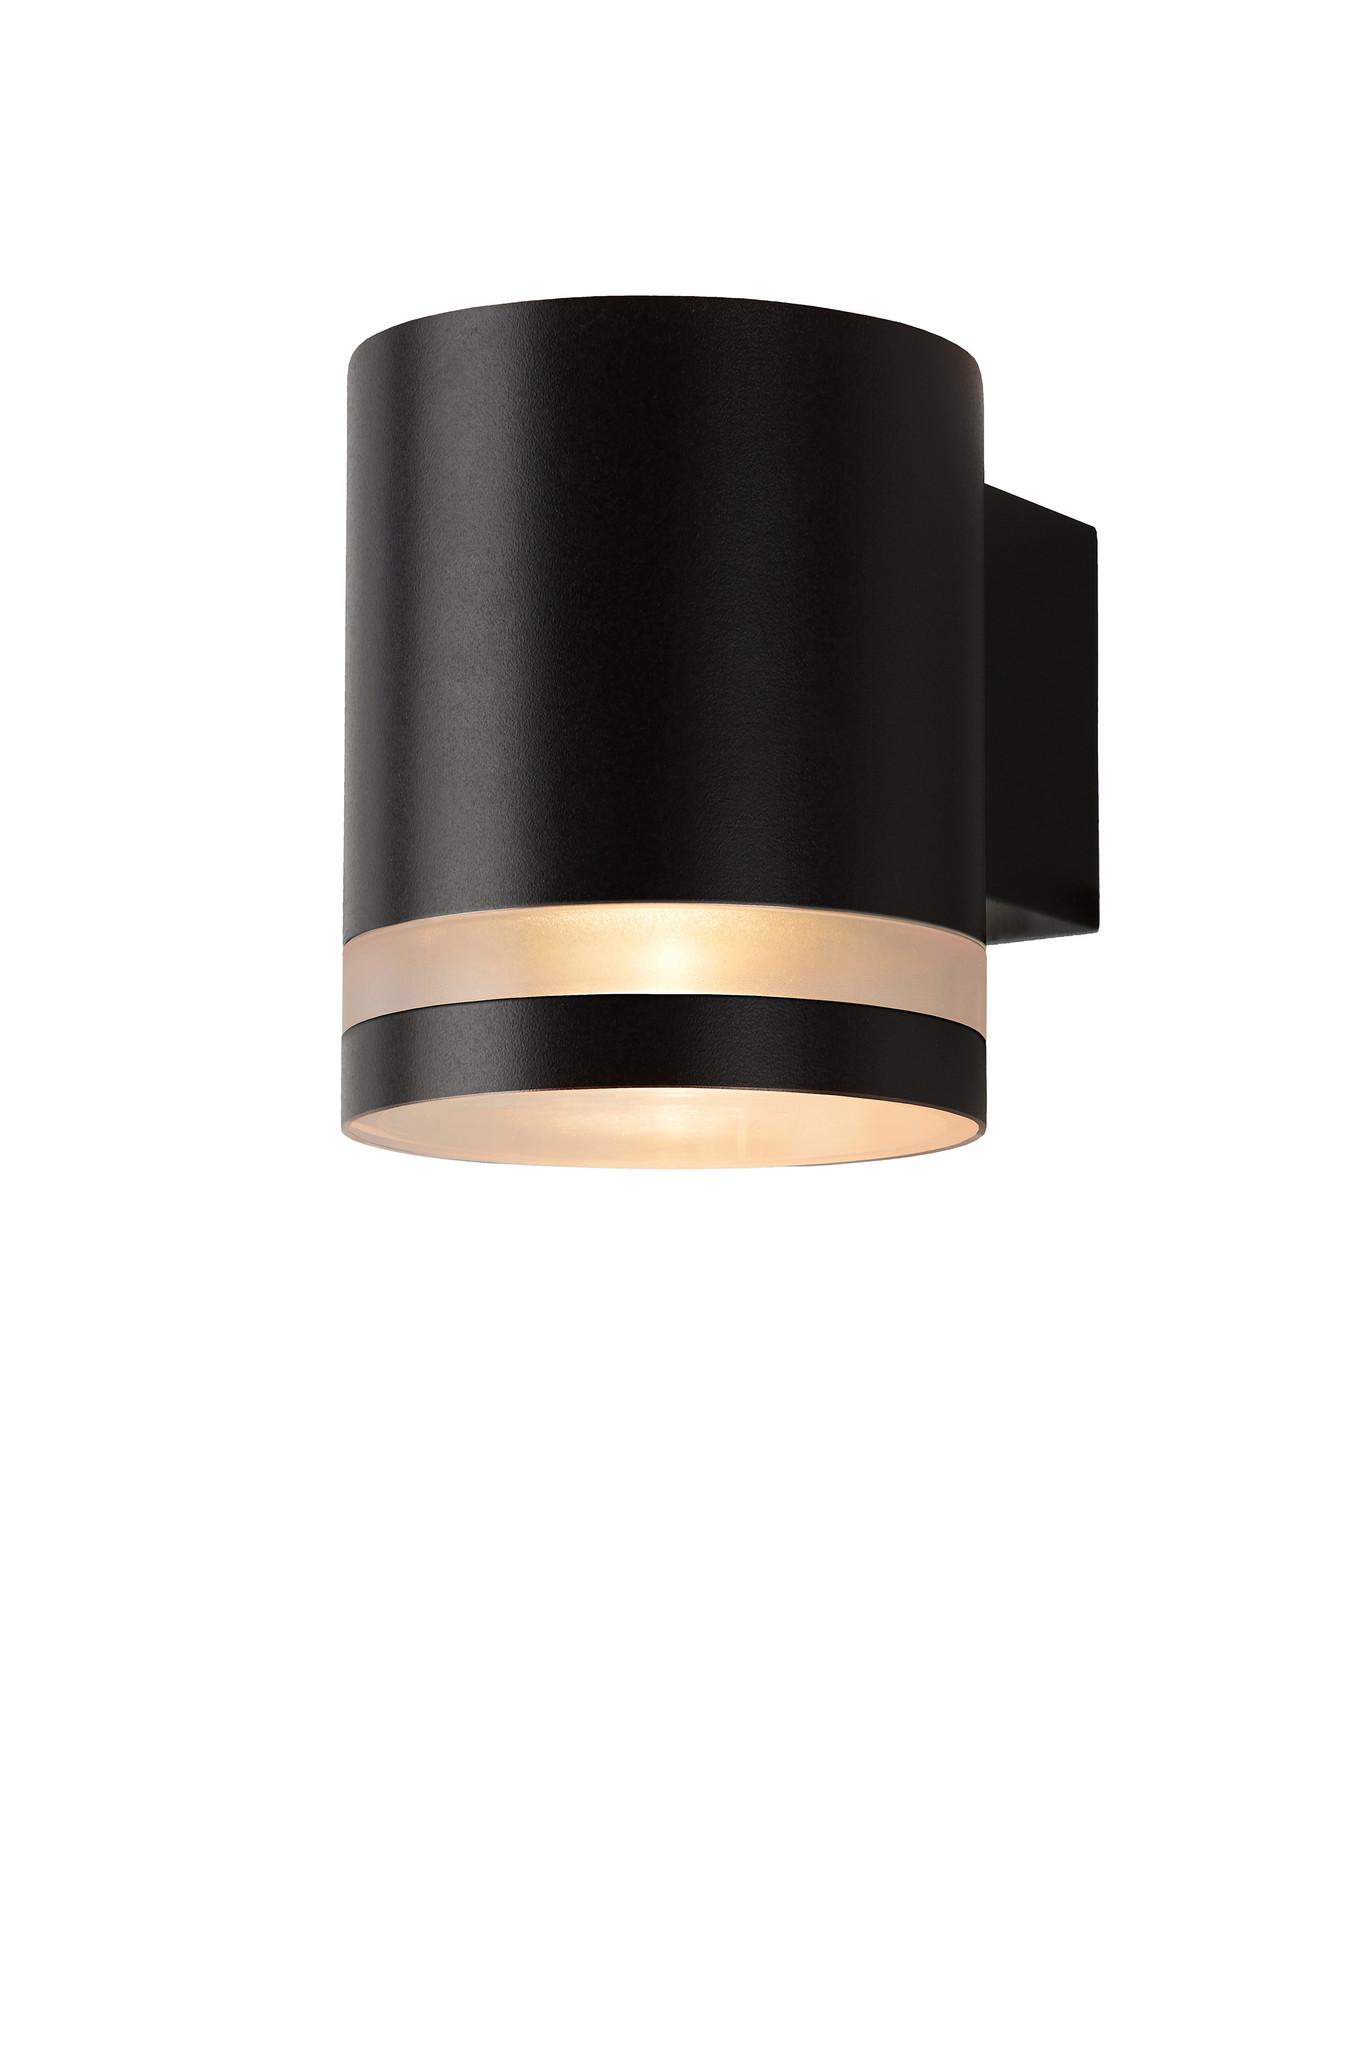 Lucide BASCO-LED Wandlicht IP54 GU10/5W (49008/05/60) Zwa